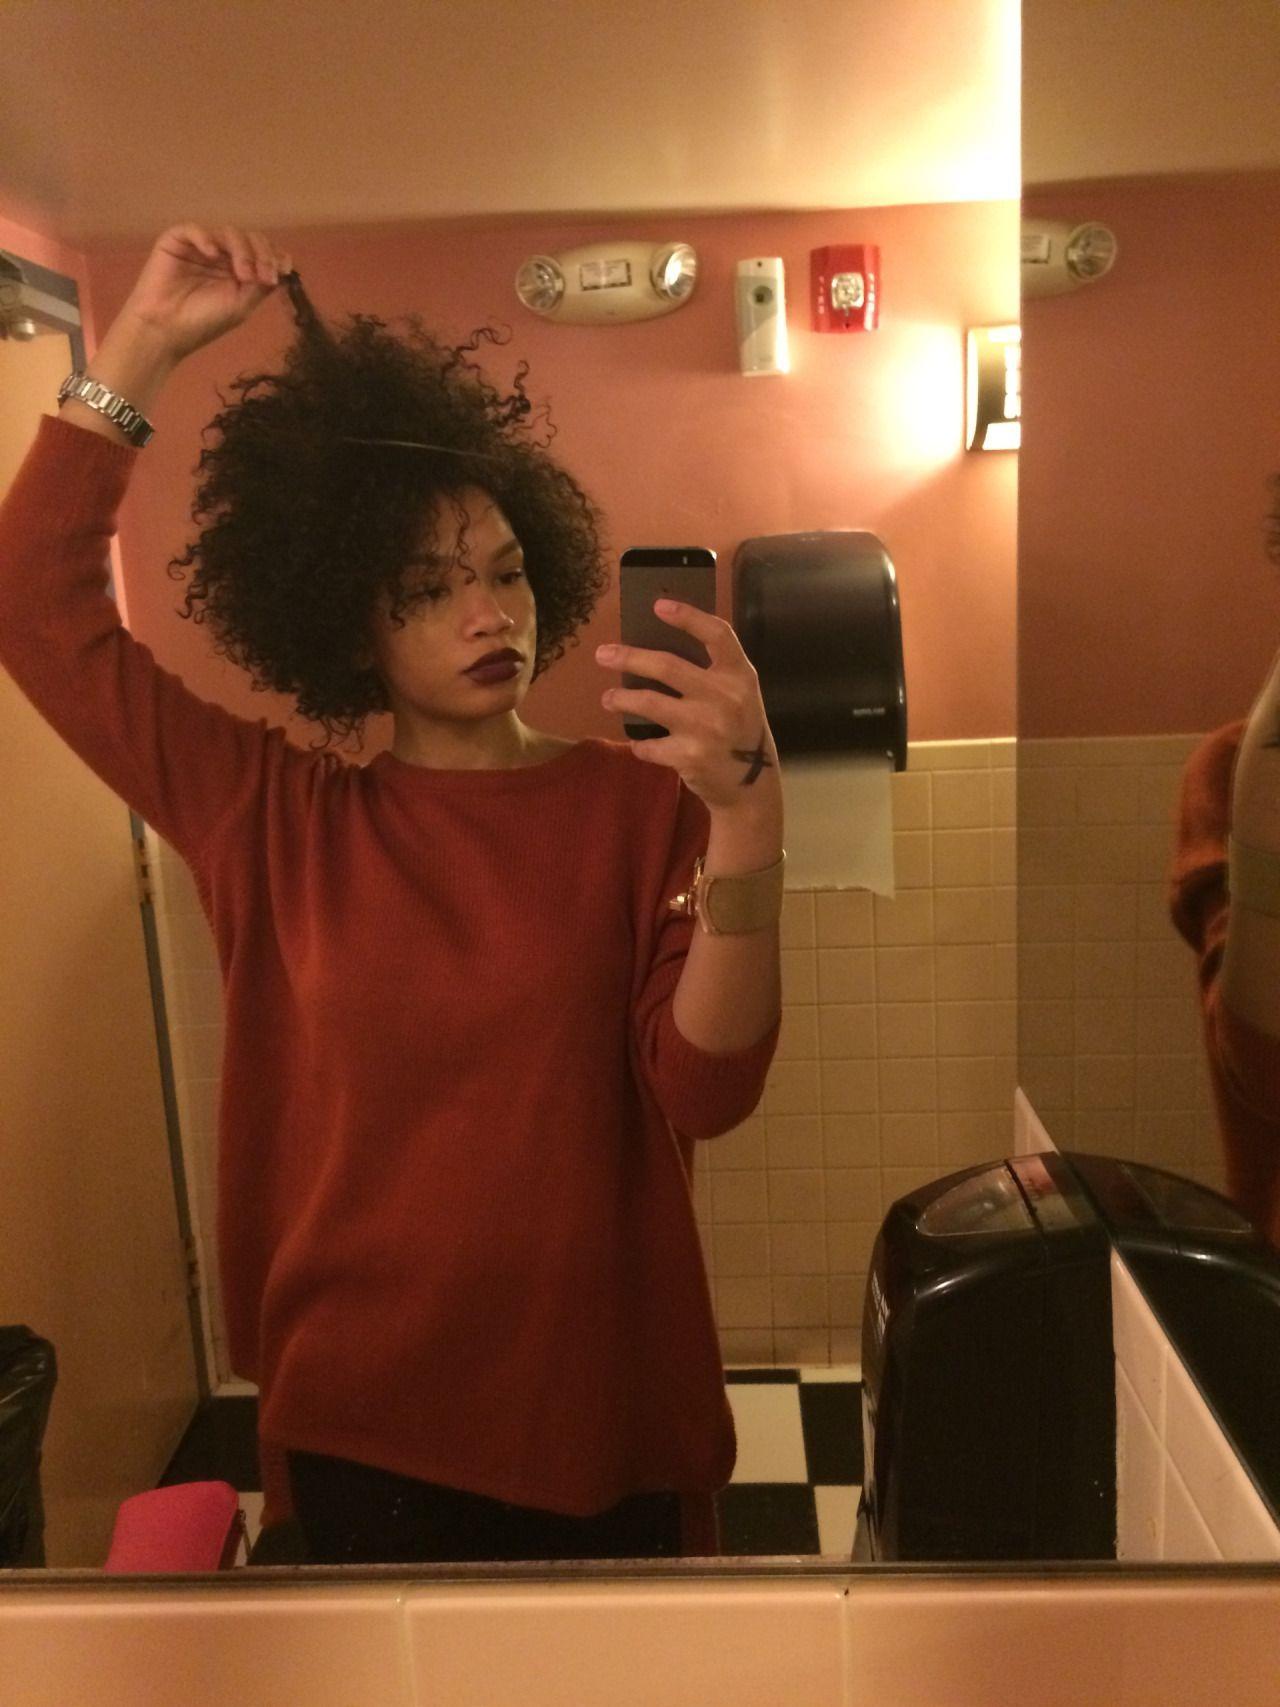 Venus Observa Feminae — naturalblkgirlsrock:   Hi i'm new to tumblr and...